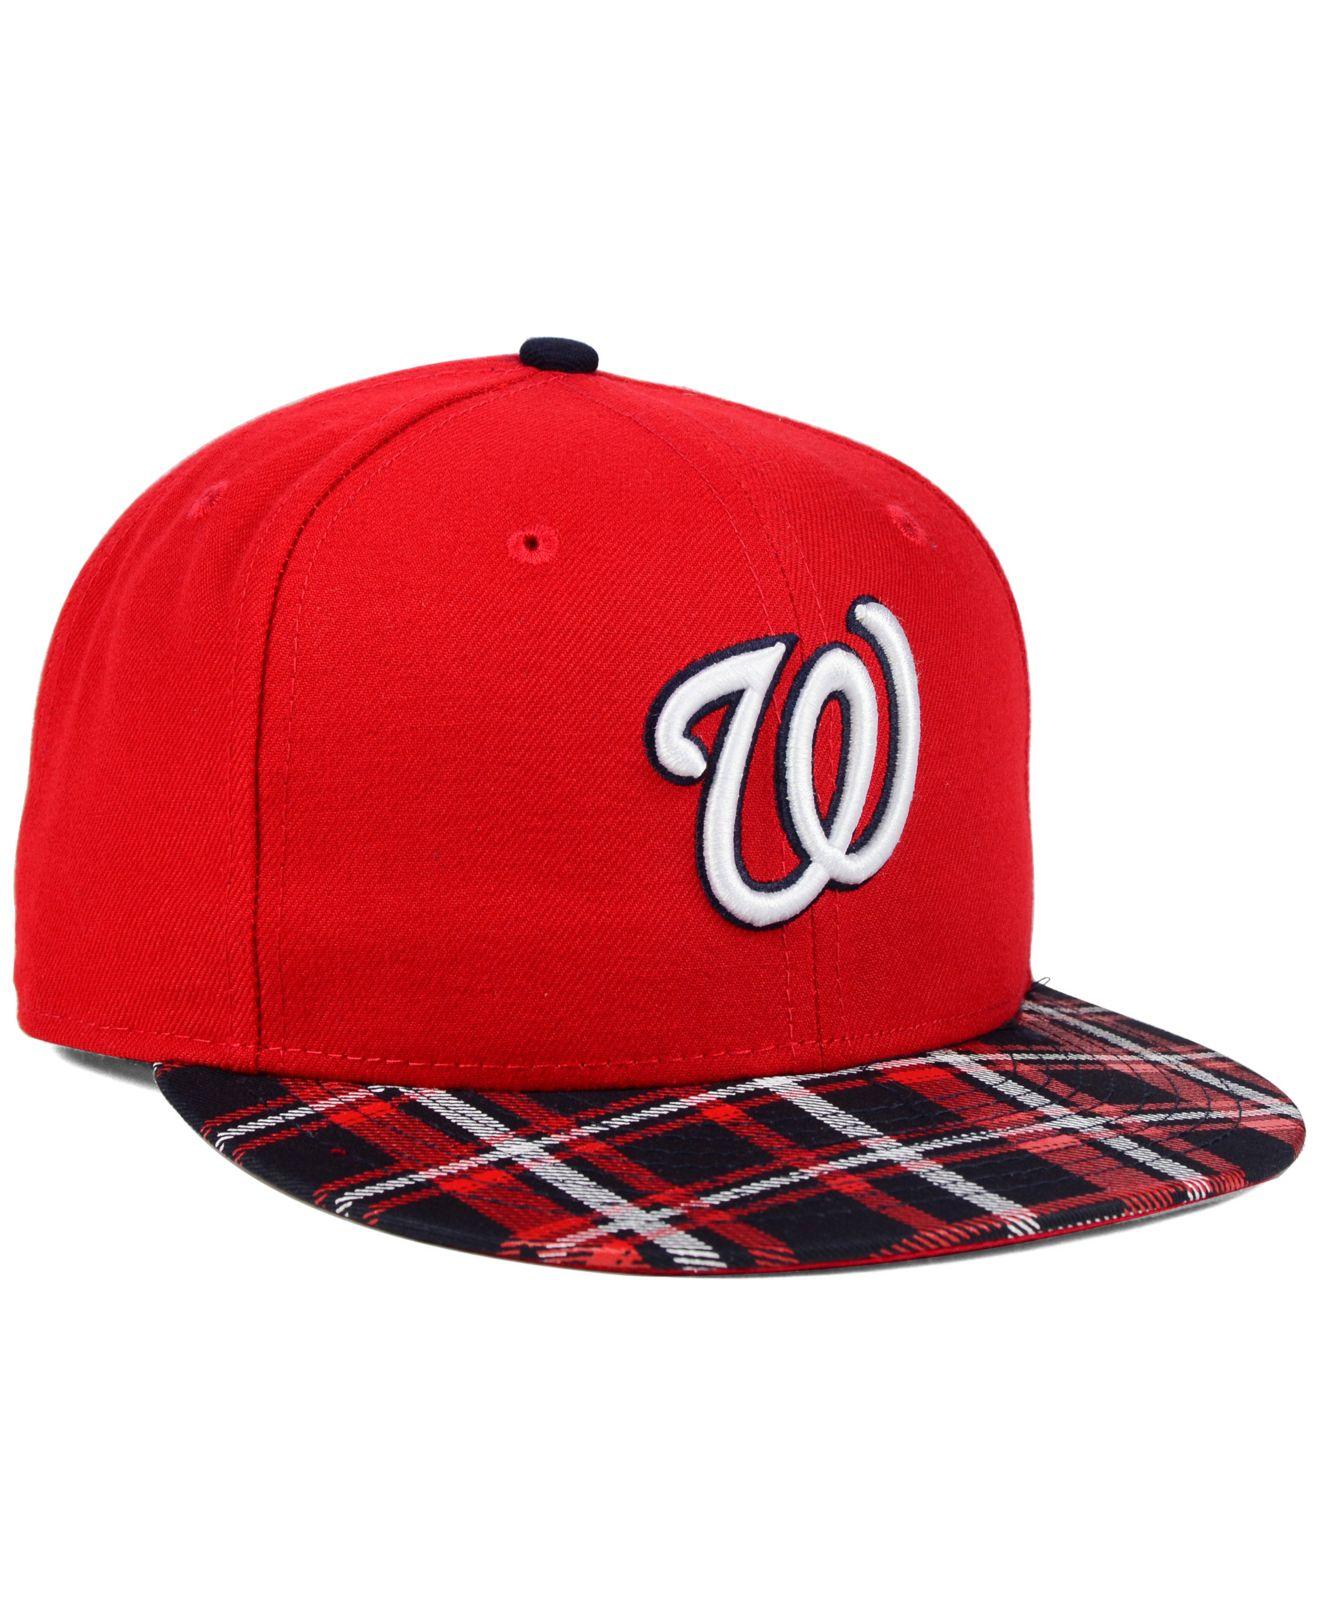 half off 093e0 ce476 ... hot lyst ktz washington nationals plaid 9fifty snapback cap in red for  men 0c26b ddf79